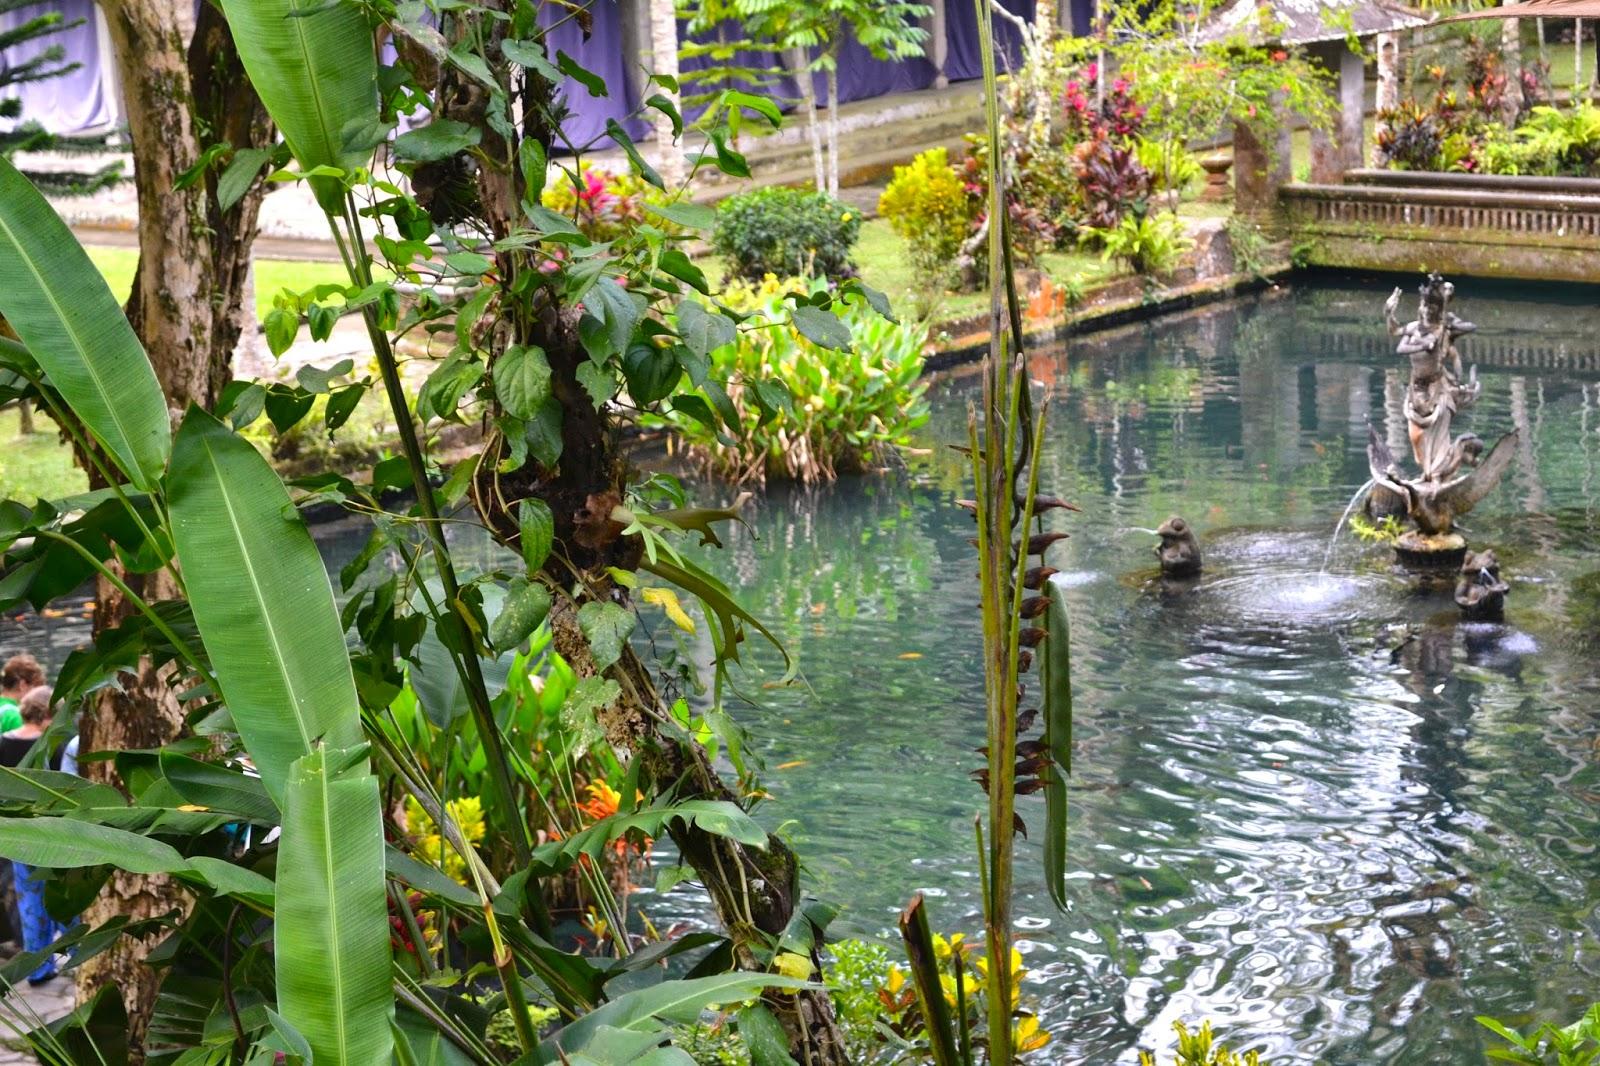 Manantial sagrado de sebatu, Bali, Indonesia